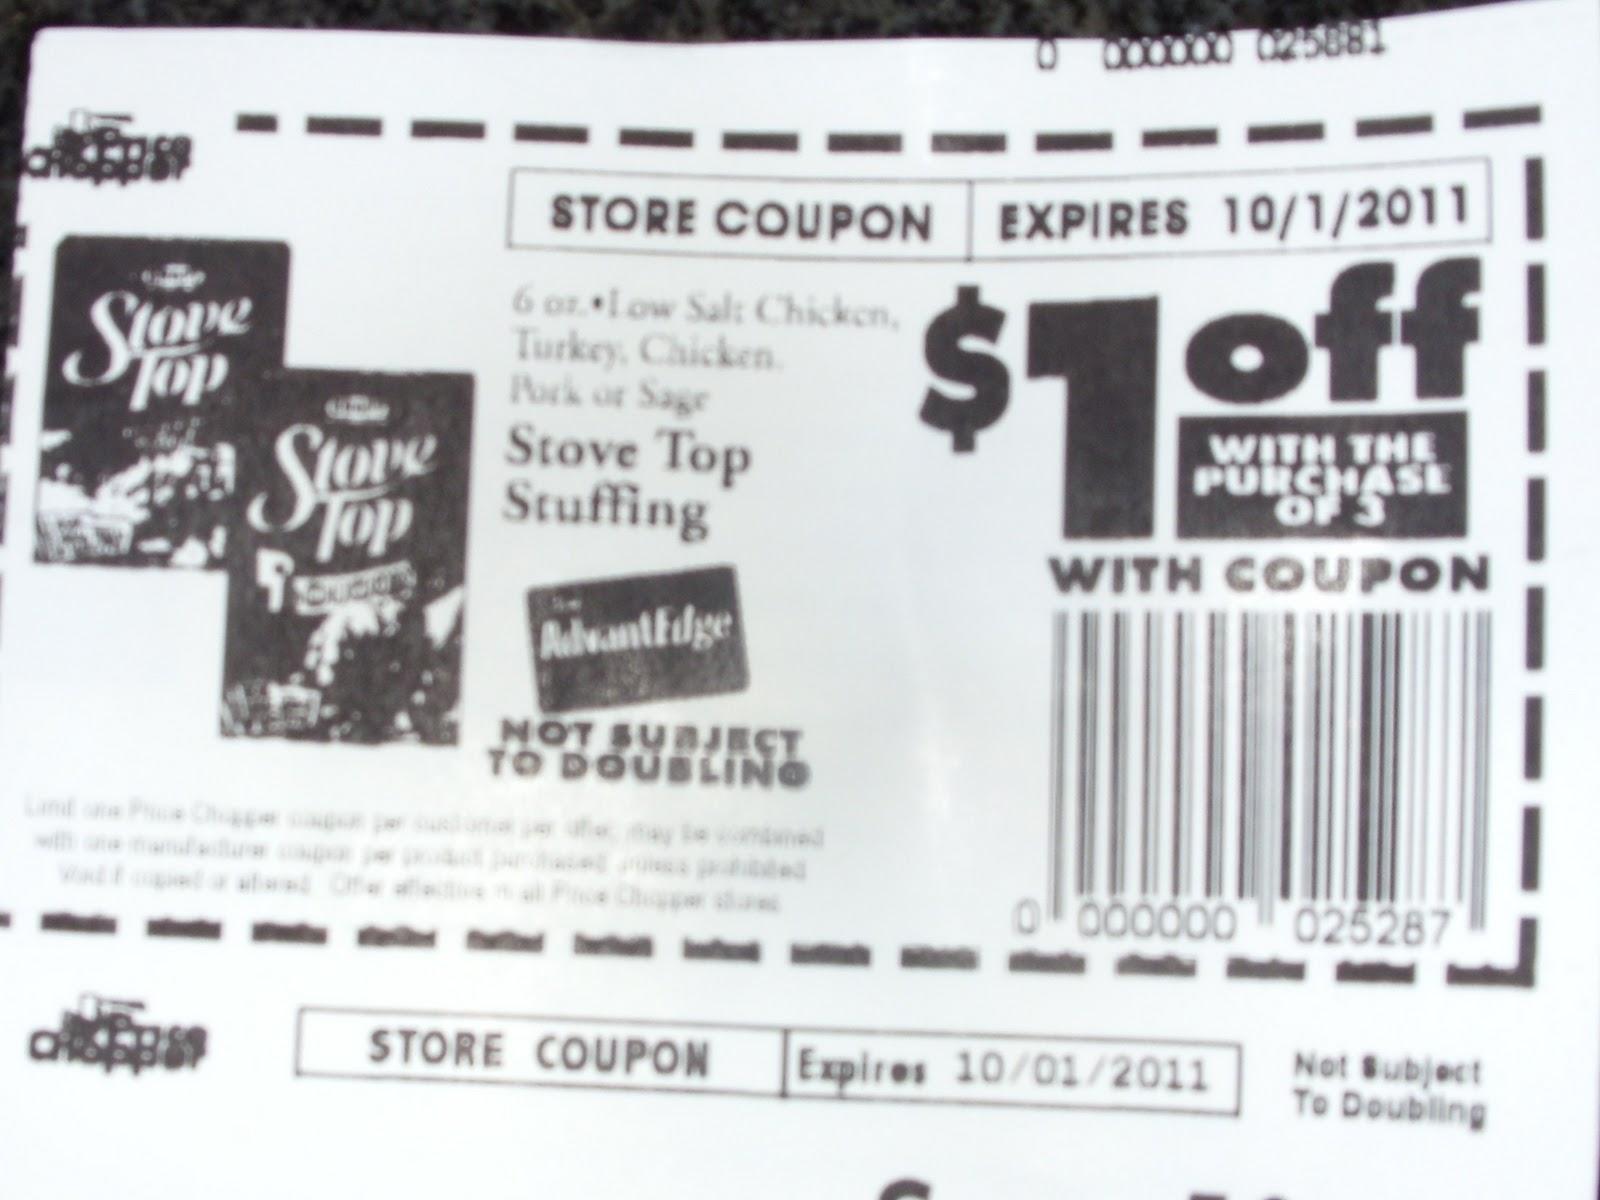 Steals com coupon code